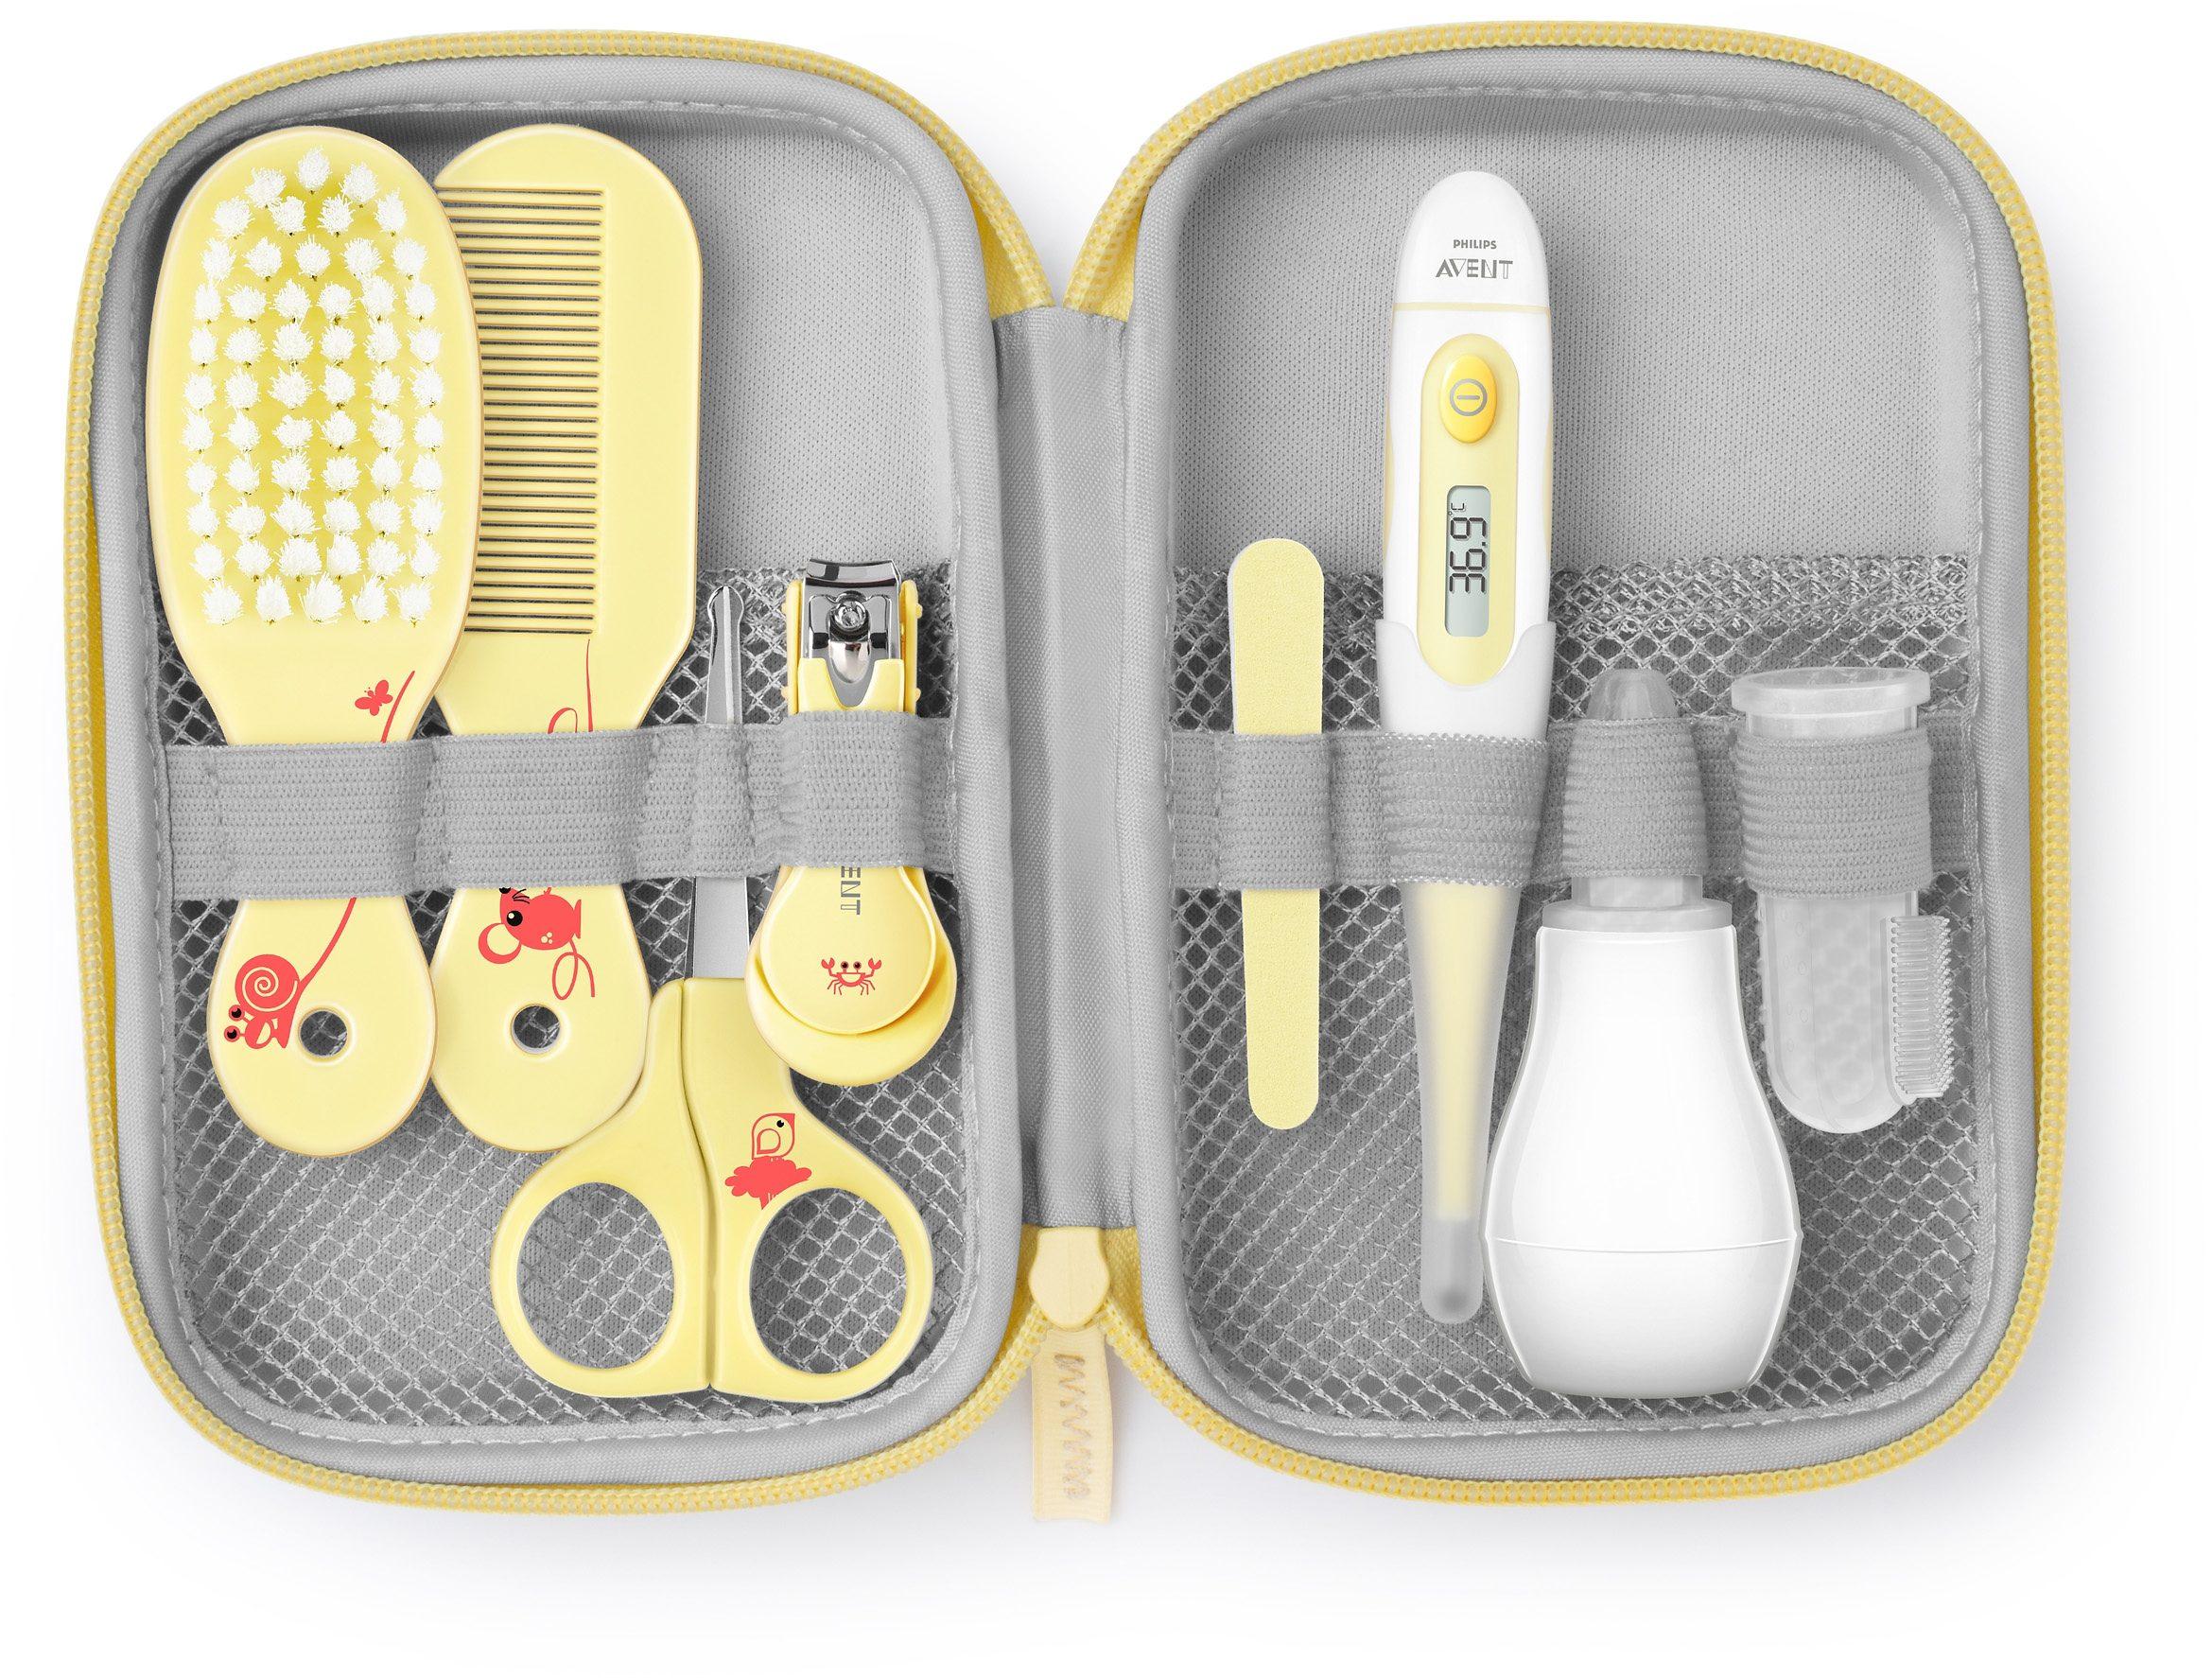 Philips Avent Babypflege-Set SCH400/00 inkl. aller Pflegeartikel, gelb/blau